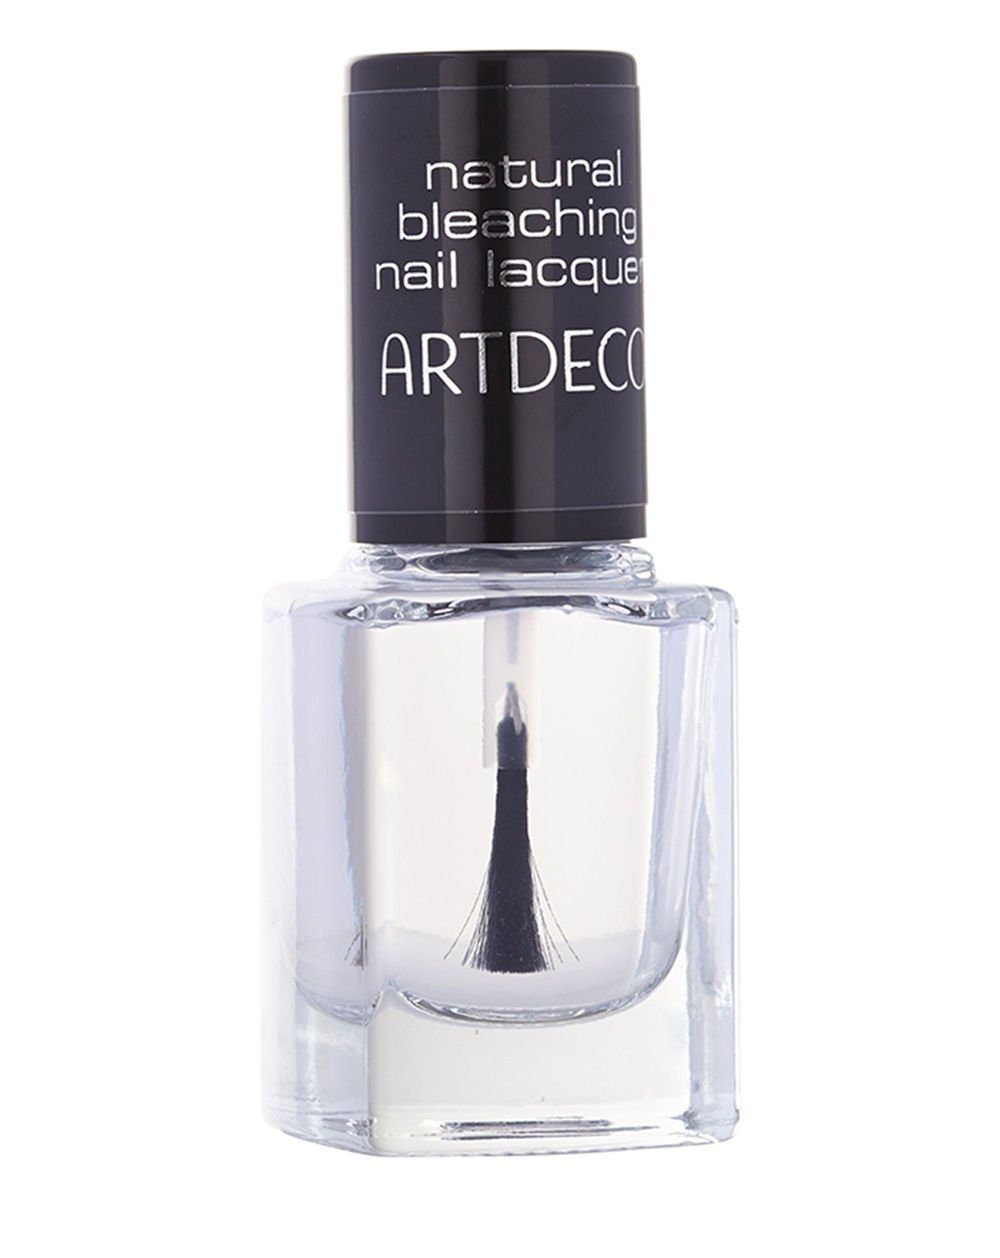 Artdeco Nagellack »Natural Bleaching Nail Lacquer«